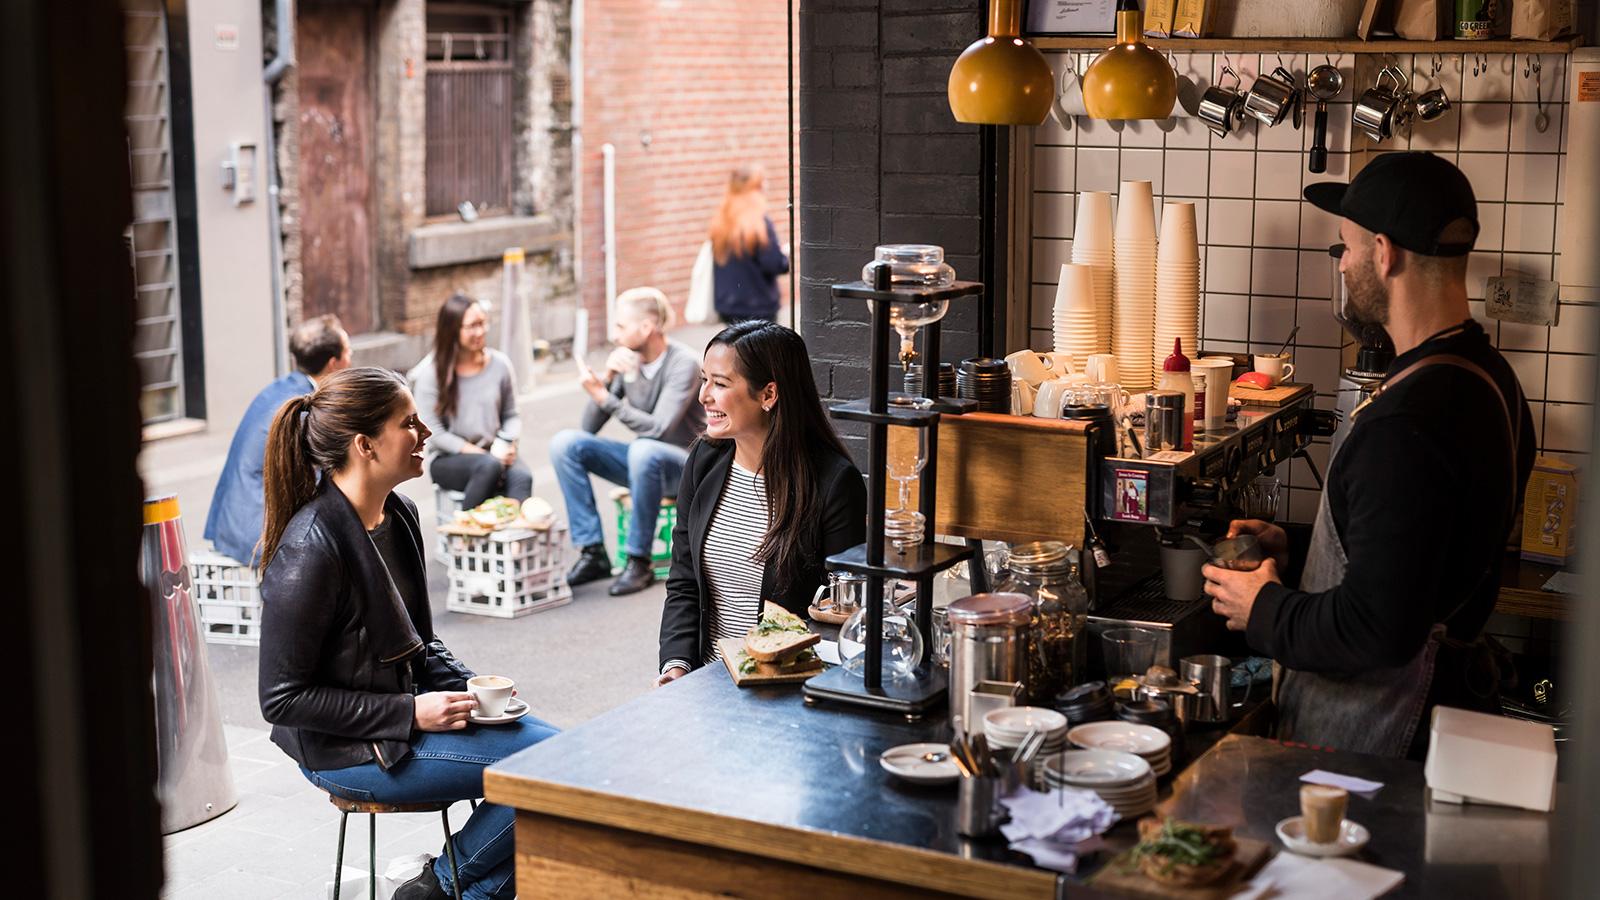 Little Mule Cafe, Melbourne, Victoria, Australia. Photo: Robert Blackburn